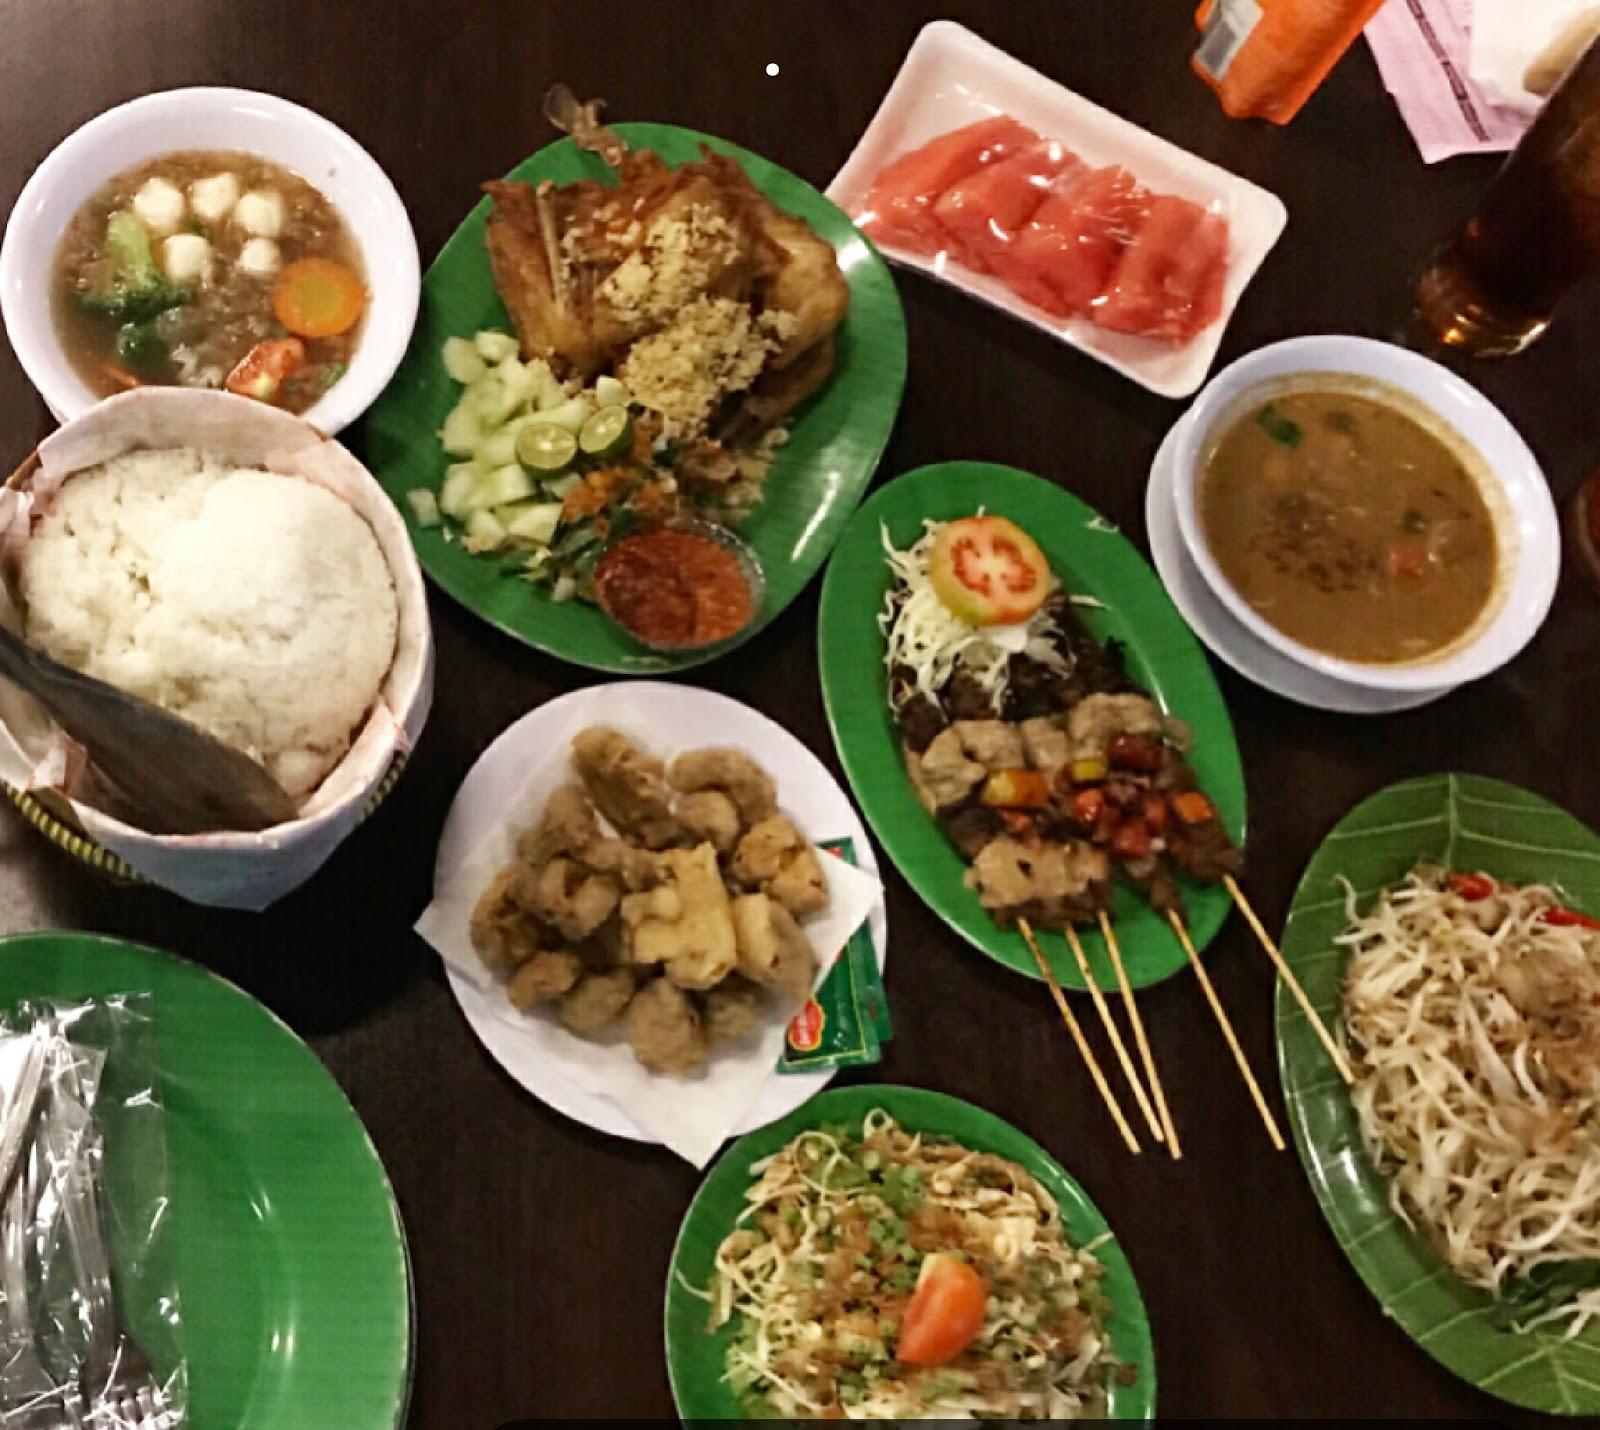 55 Tempat Wisata Kuliner Di Jogja Yang Wajib Anda Cicipi